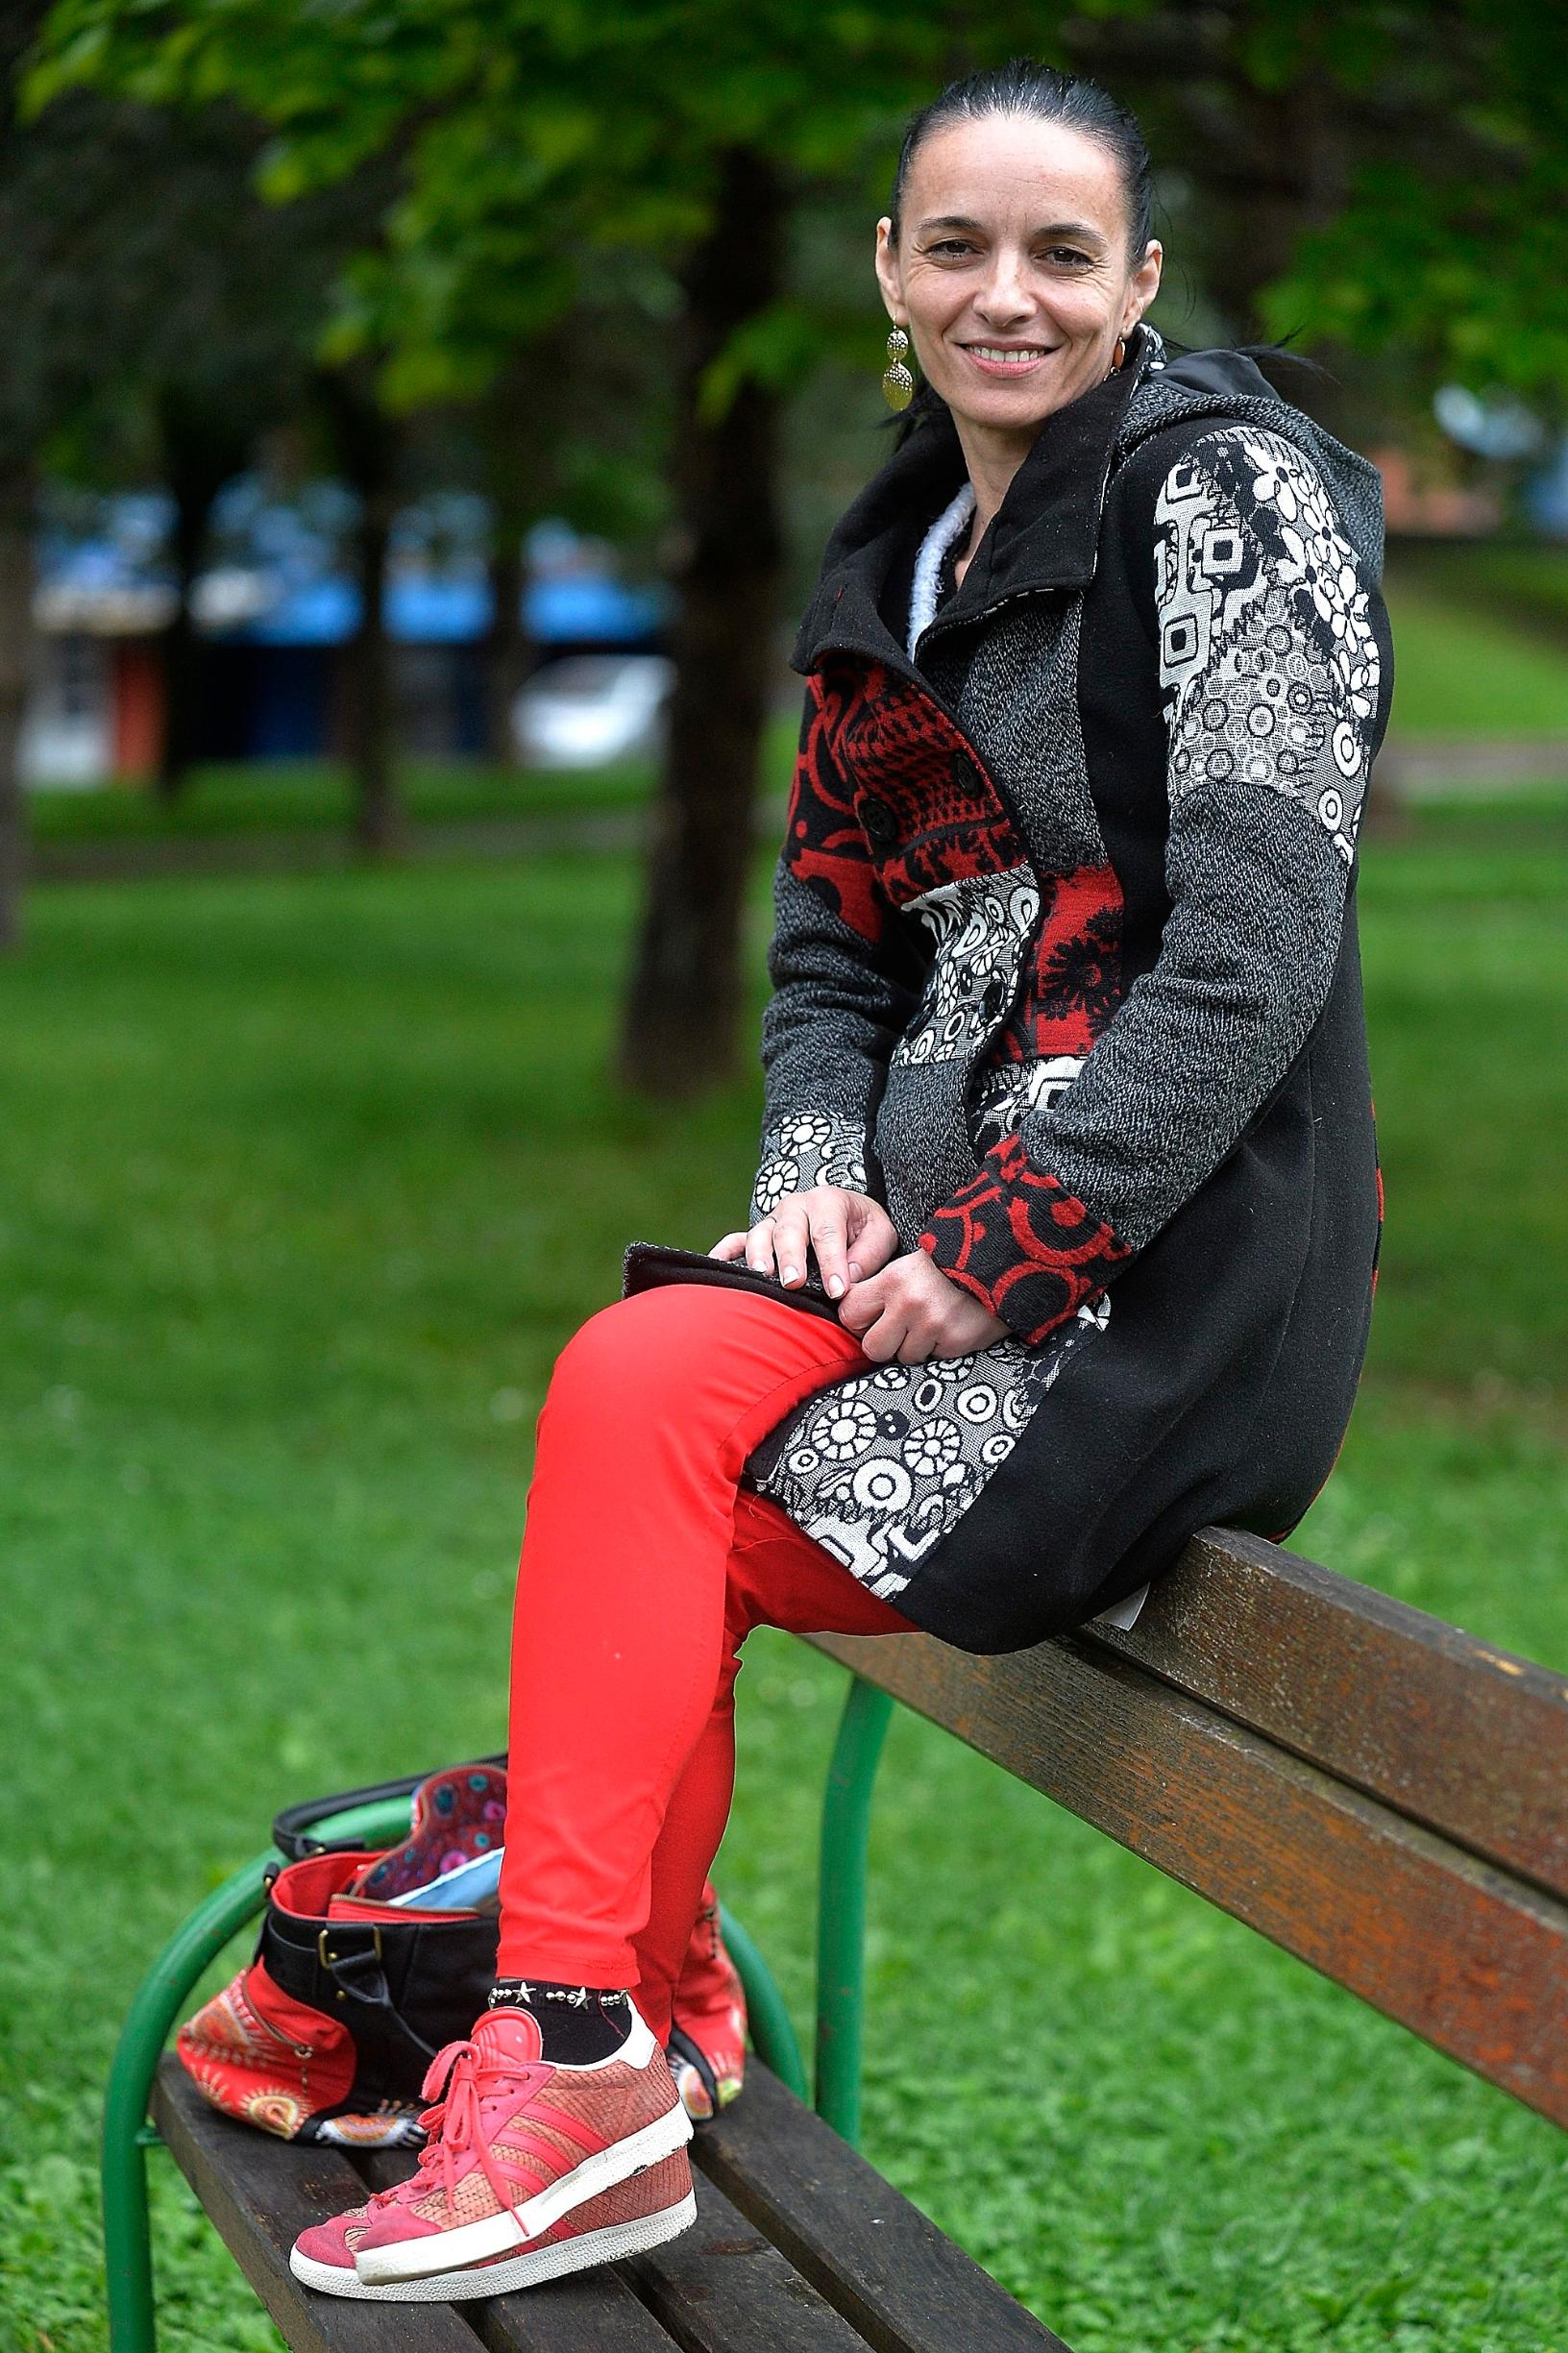 Zagreb, 200520. Ulica Dudovec, Vrapce. Liljana Raguz Hoic, ooljela od raka gusterace. Na fotografiji: Liljana Raguz Hoic. Foto: Damir Krajac / CROPIX DOKTR U KUCI